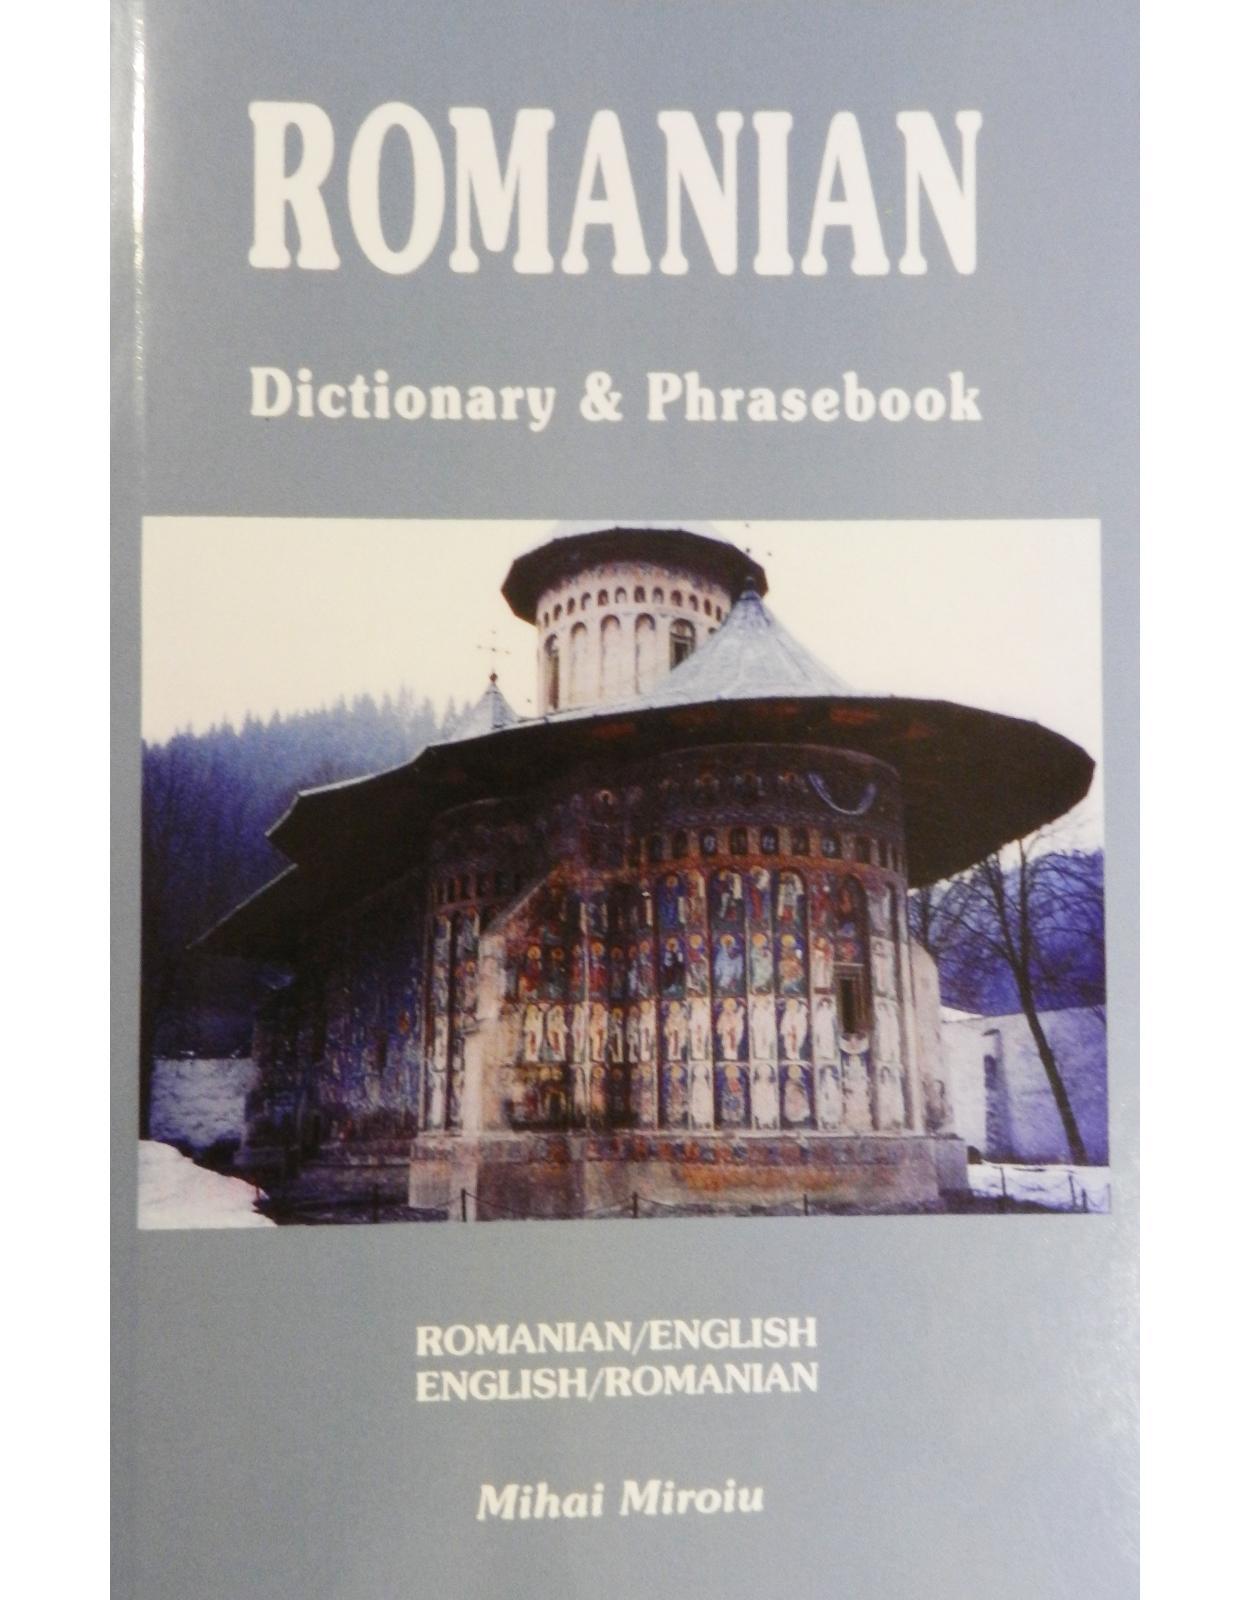 Romanian Dictionary & Phrasebook